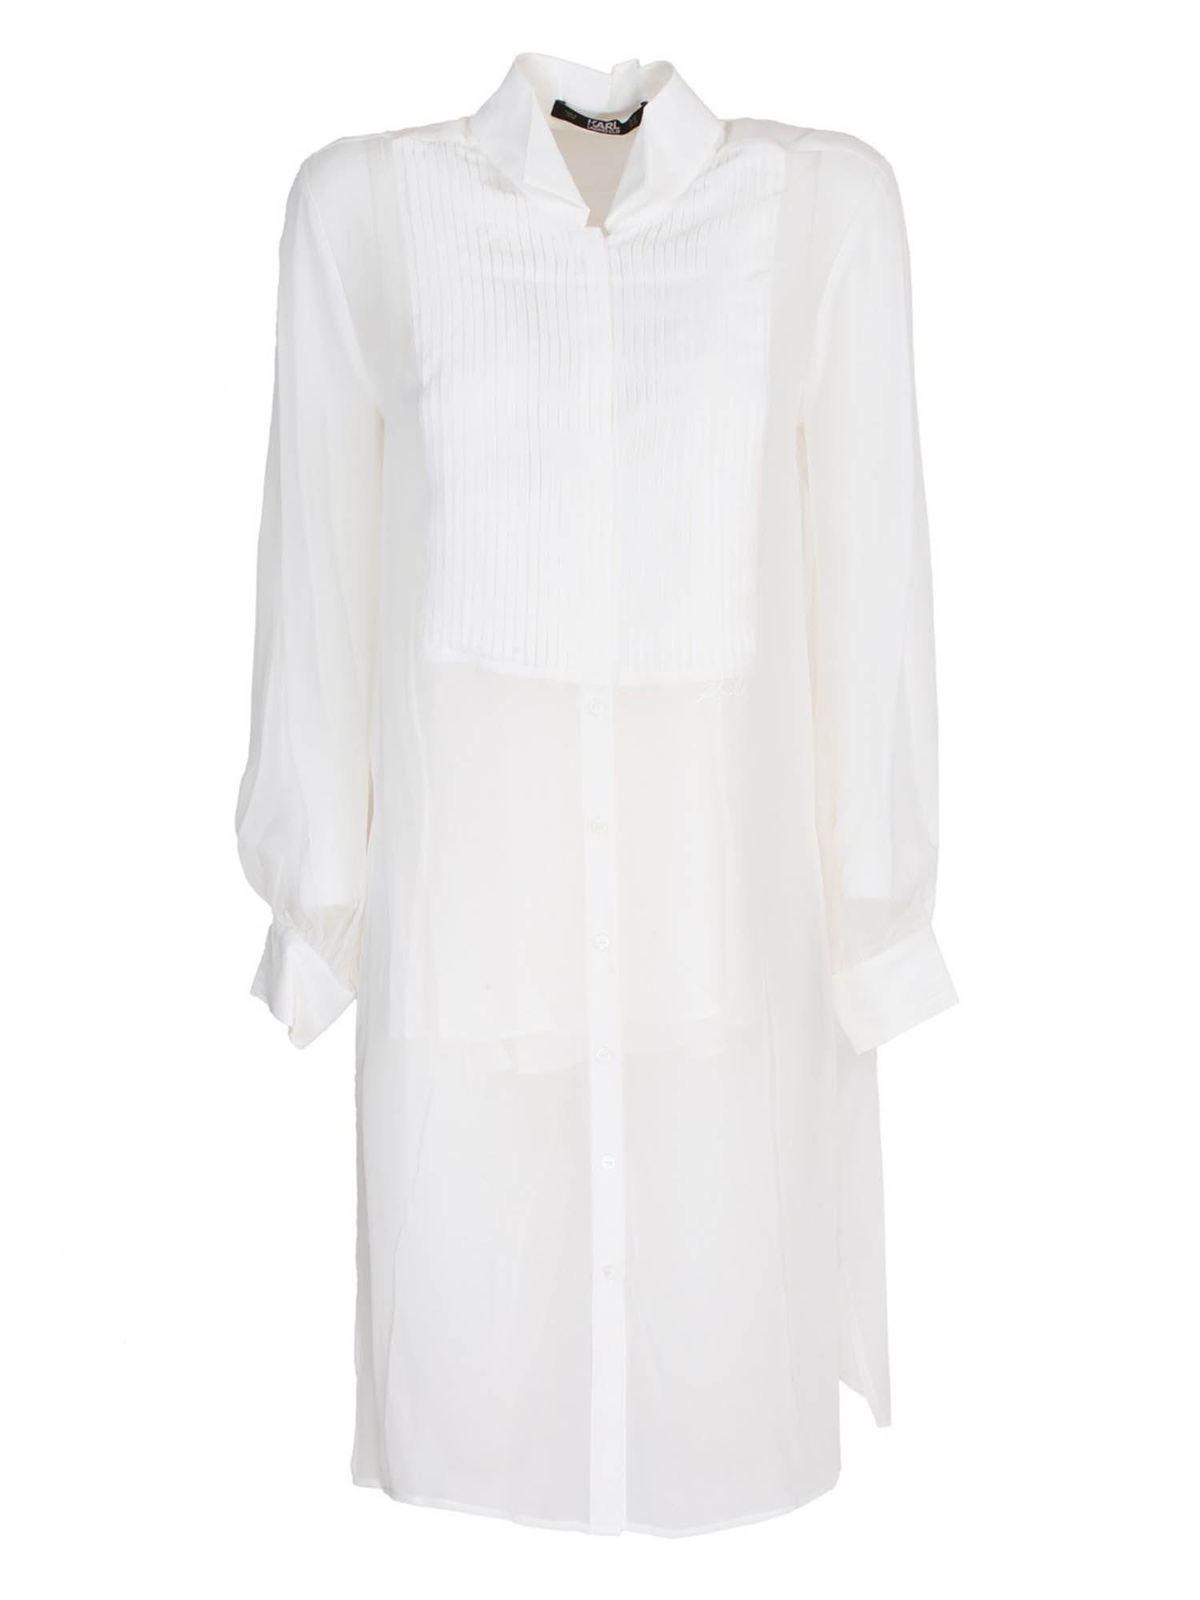 Karl Lagerfeld LONG SILK SHIRT IN WHITE